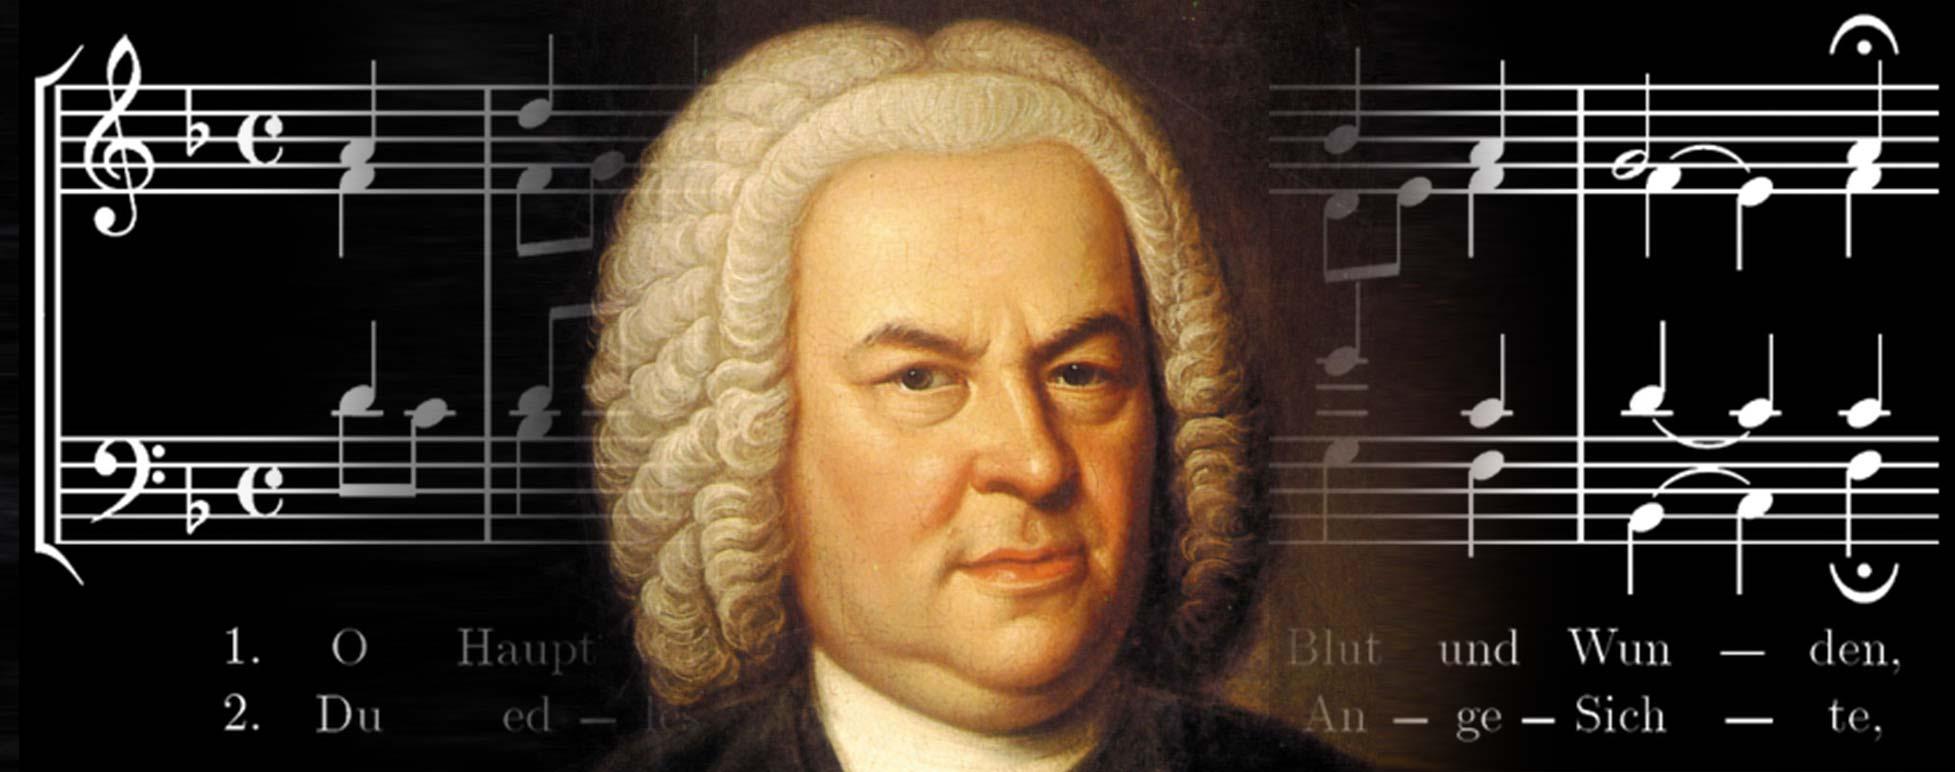 Werk en leven rond Bach